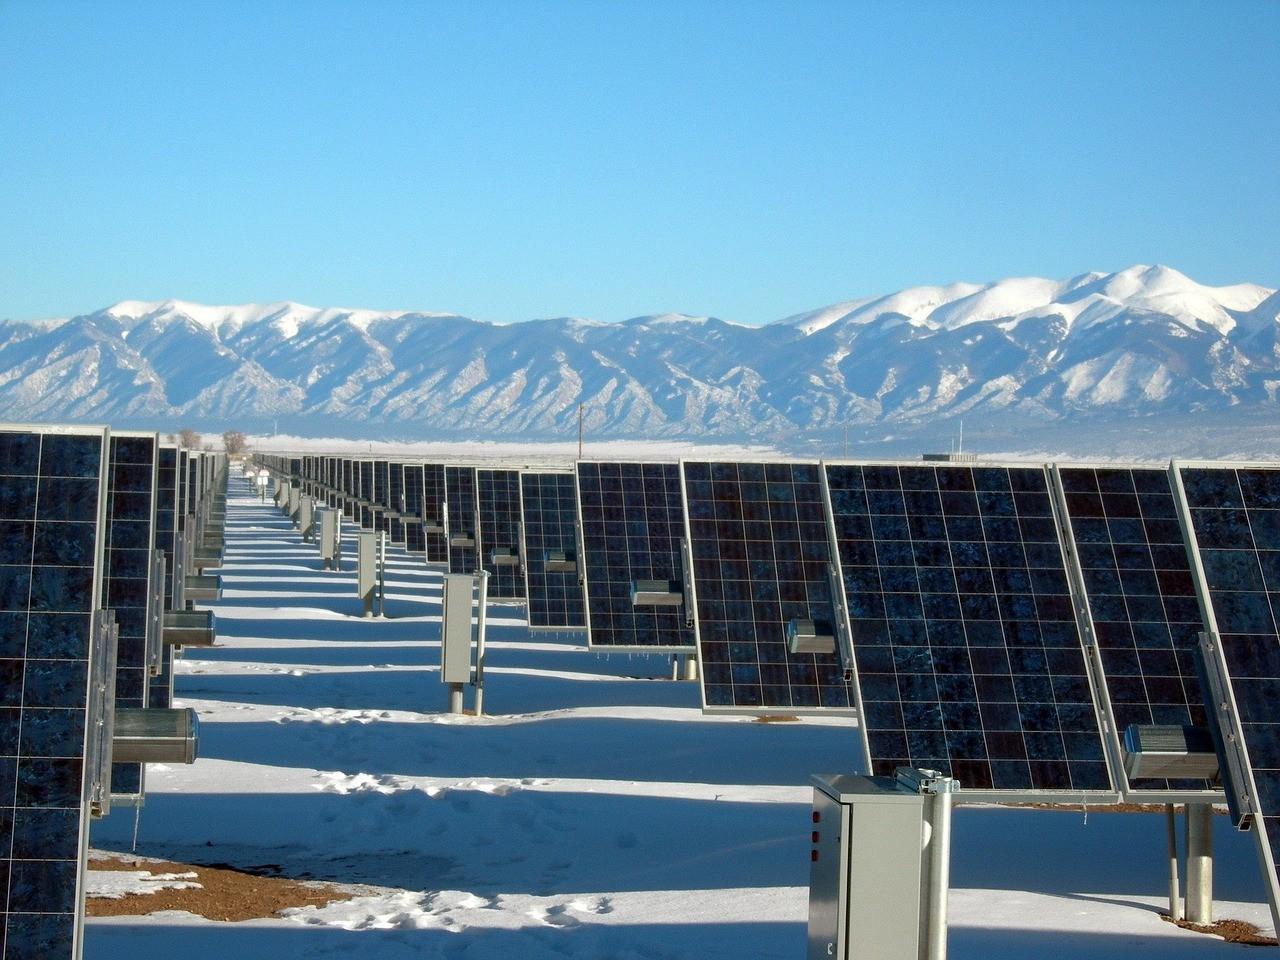 solar-panel-array-1591359_1280.jpg